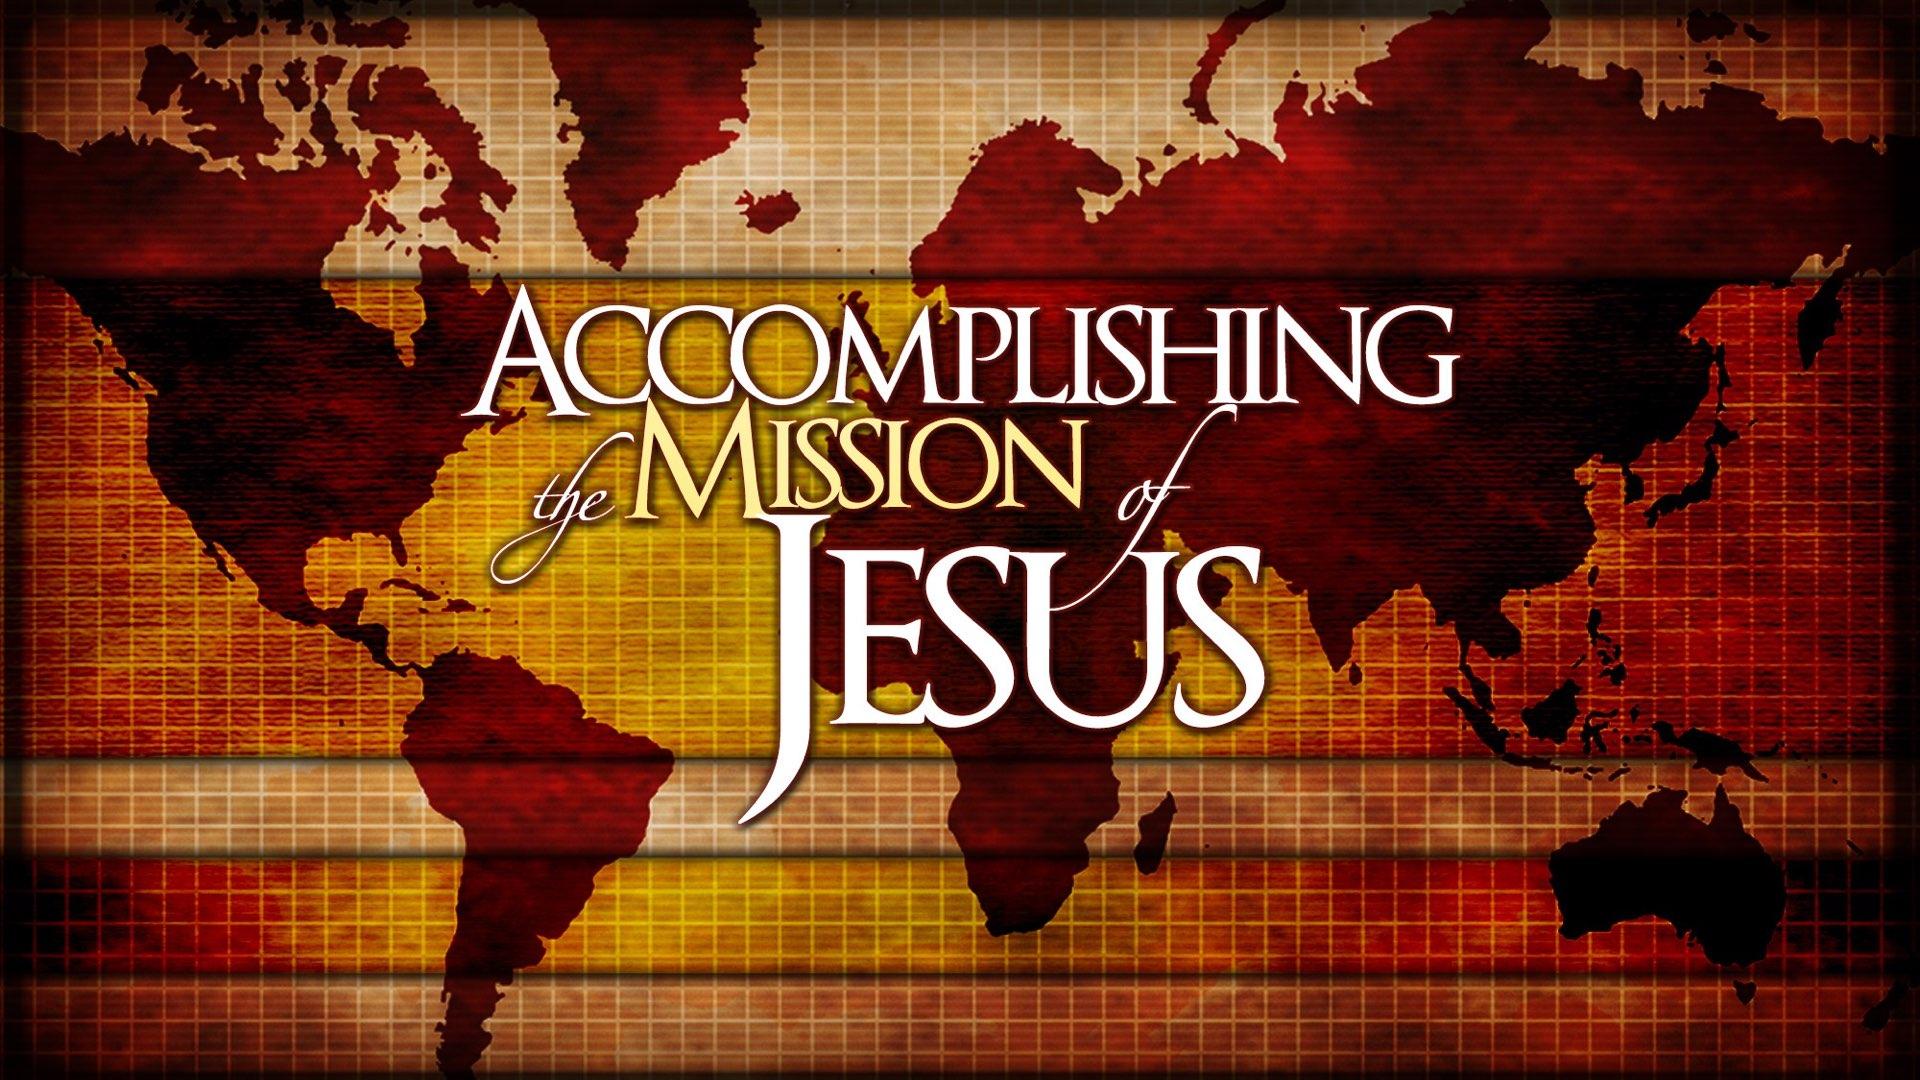 Accomplishing The Mission of Jesus.001